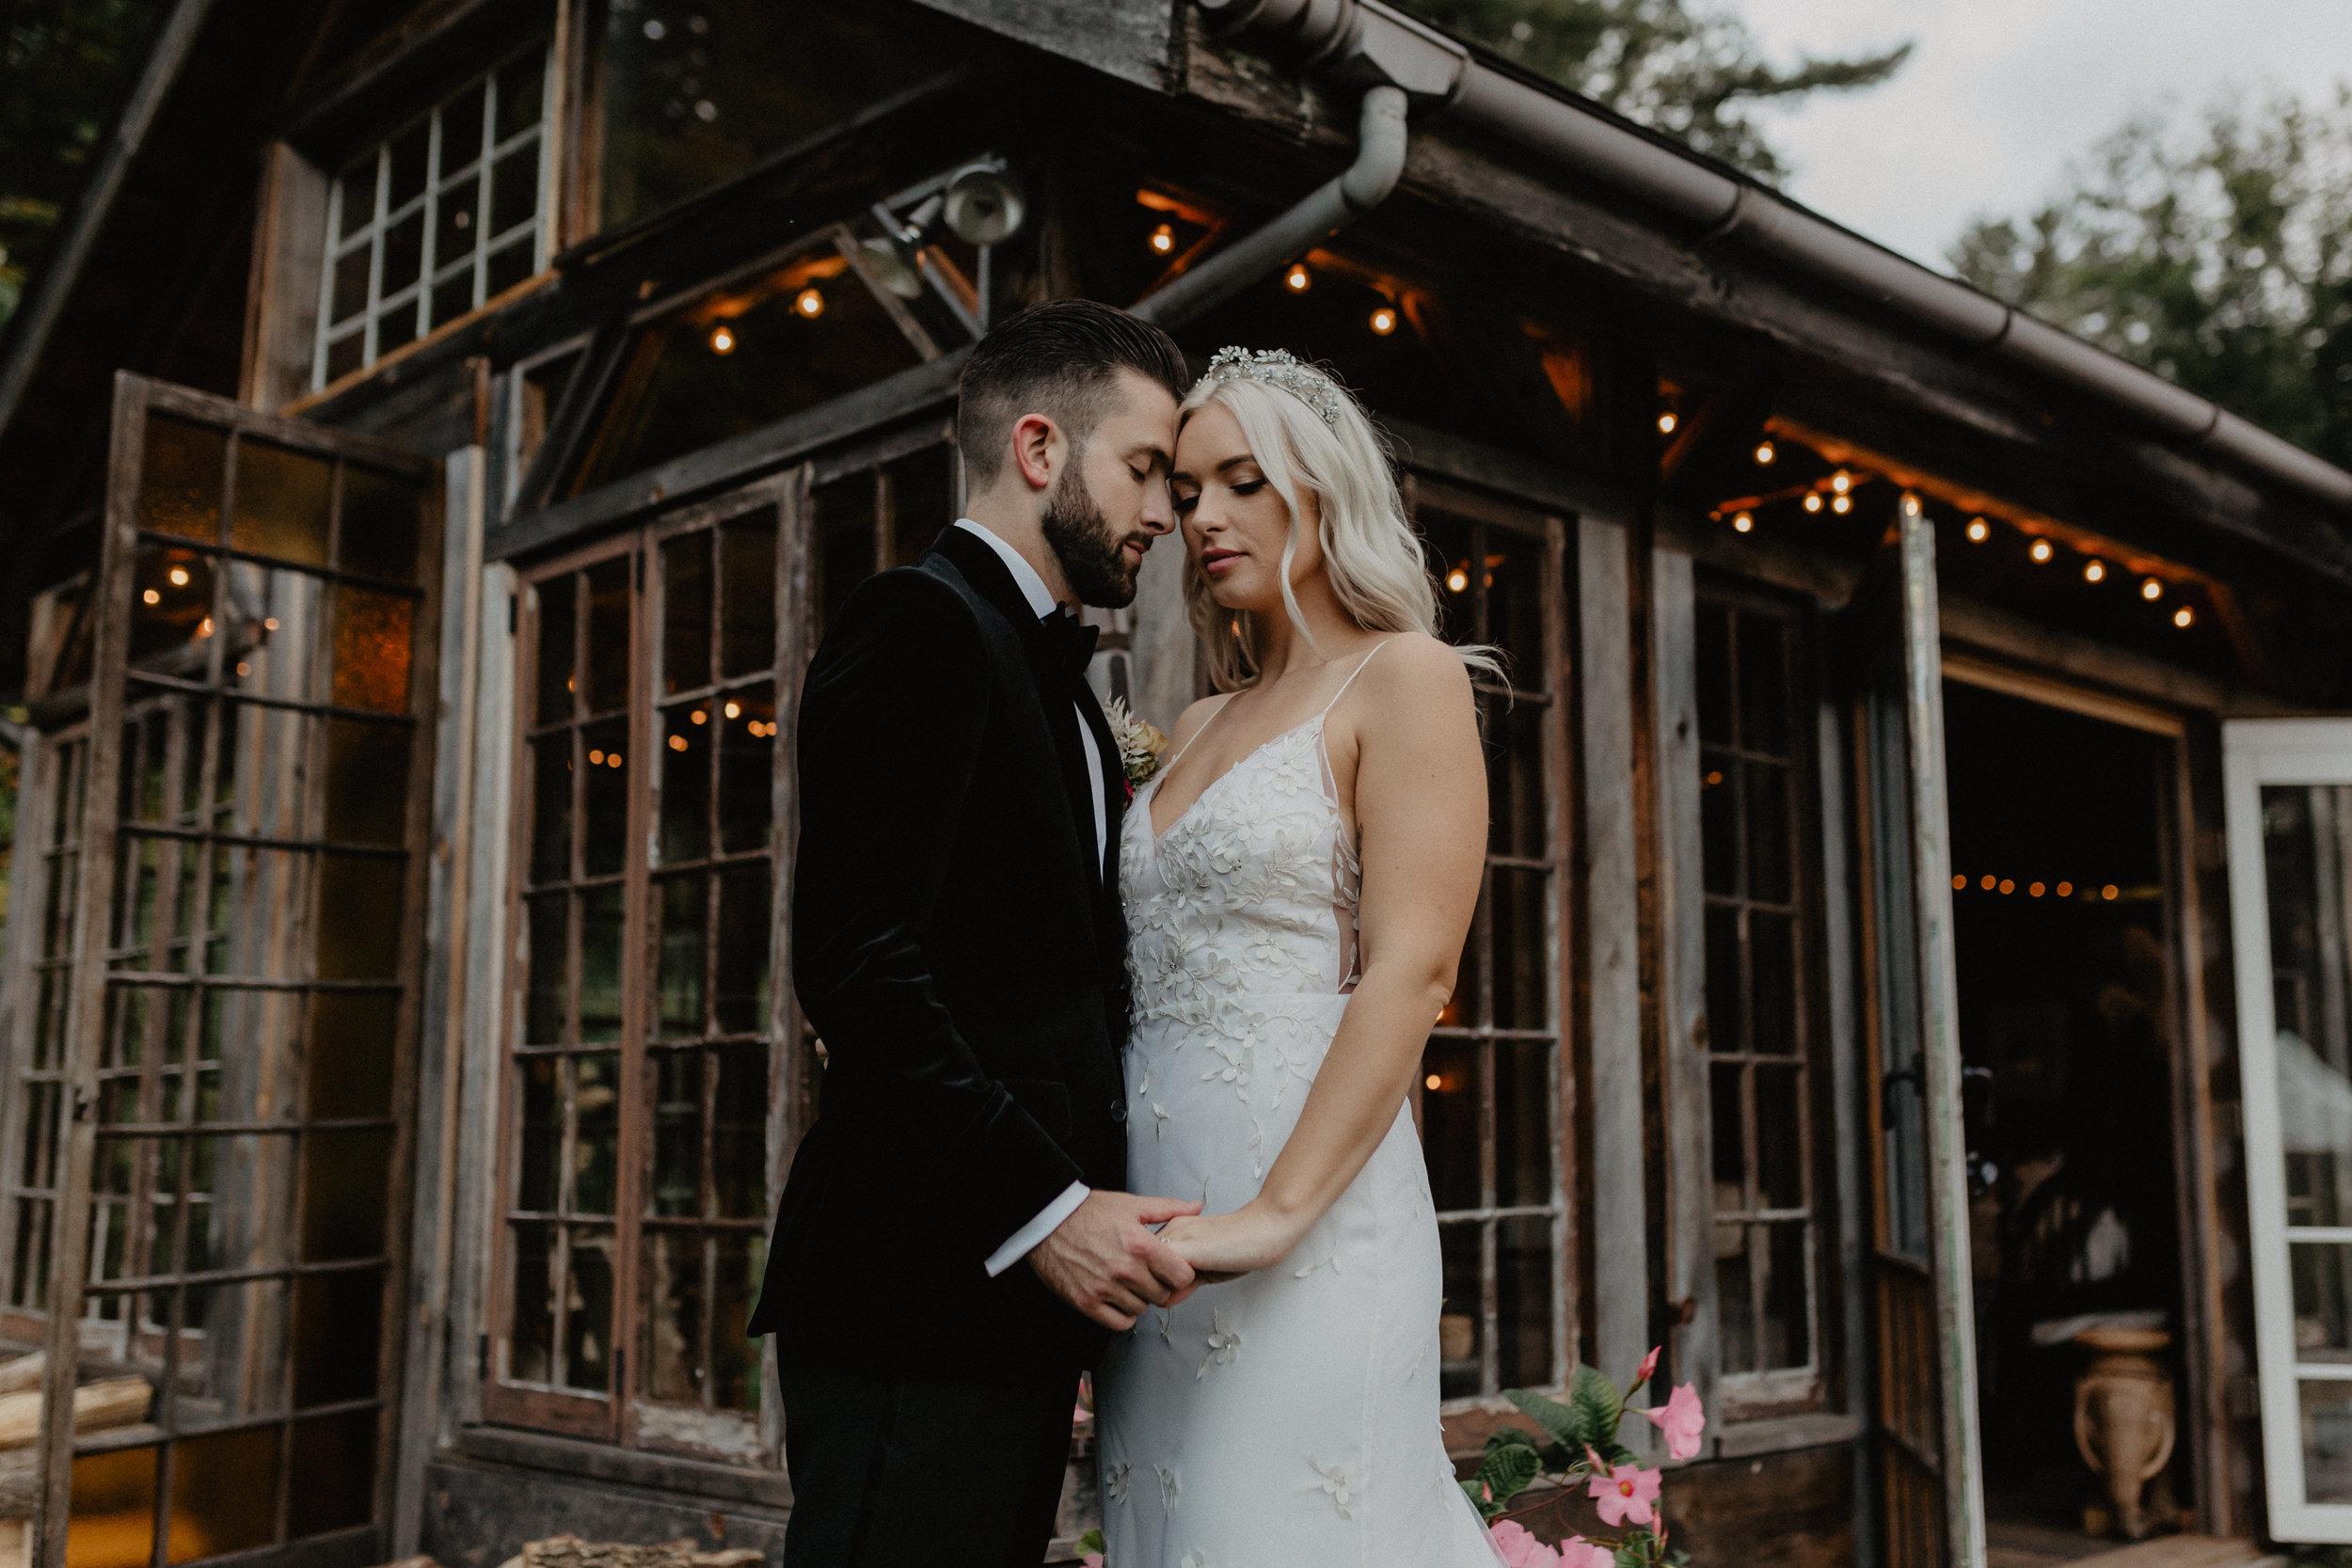 foxfire-mountain-house-wedding122.jpg